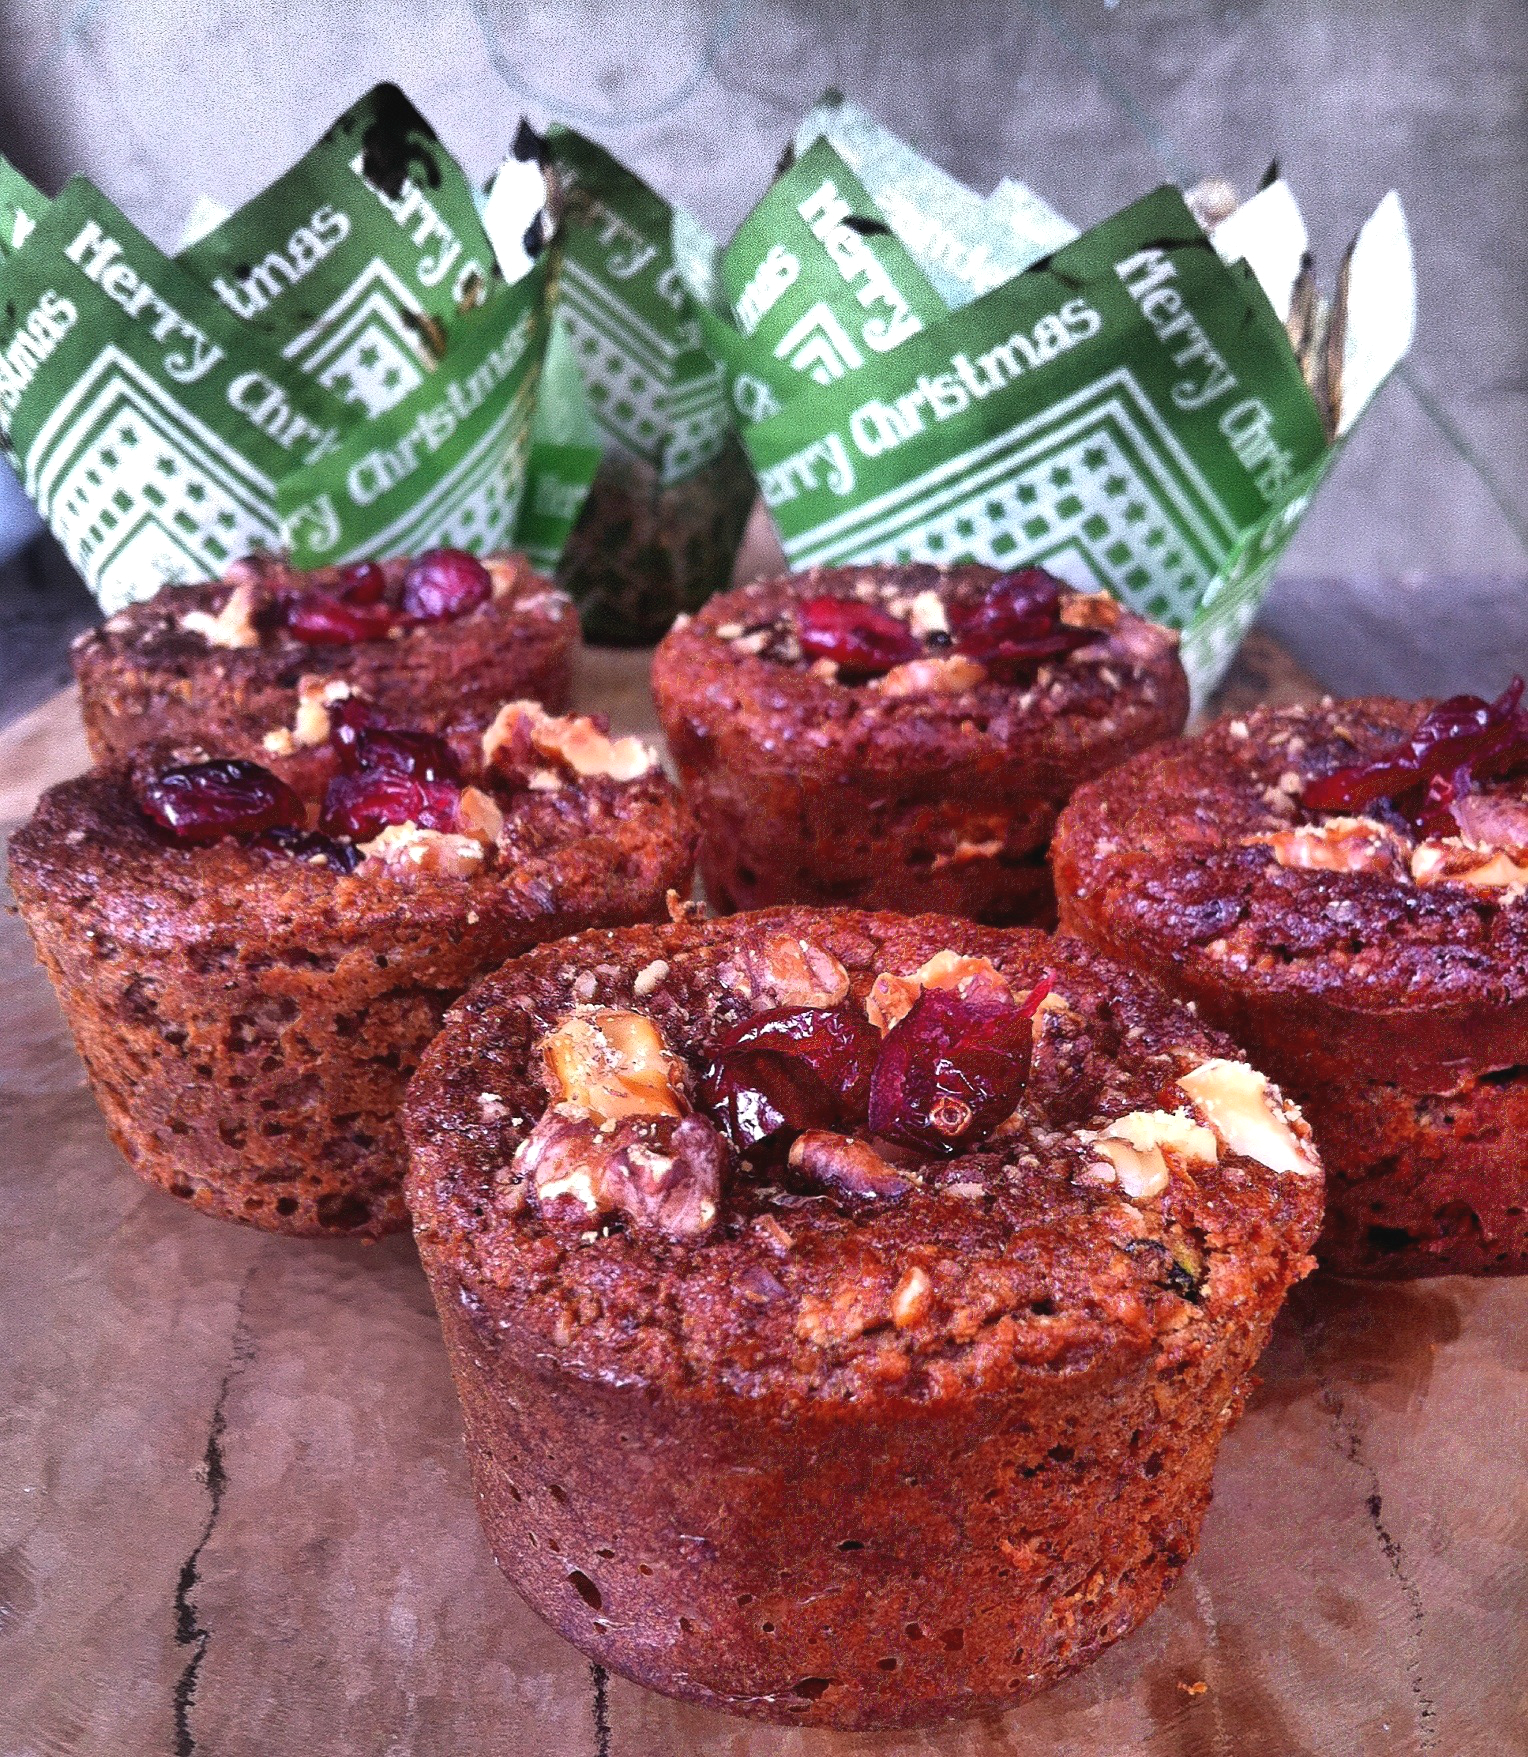 Grain-free Zucchini Muffins